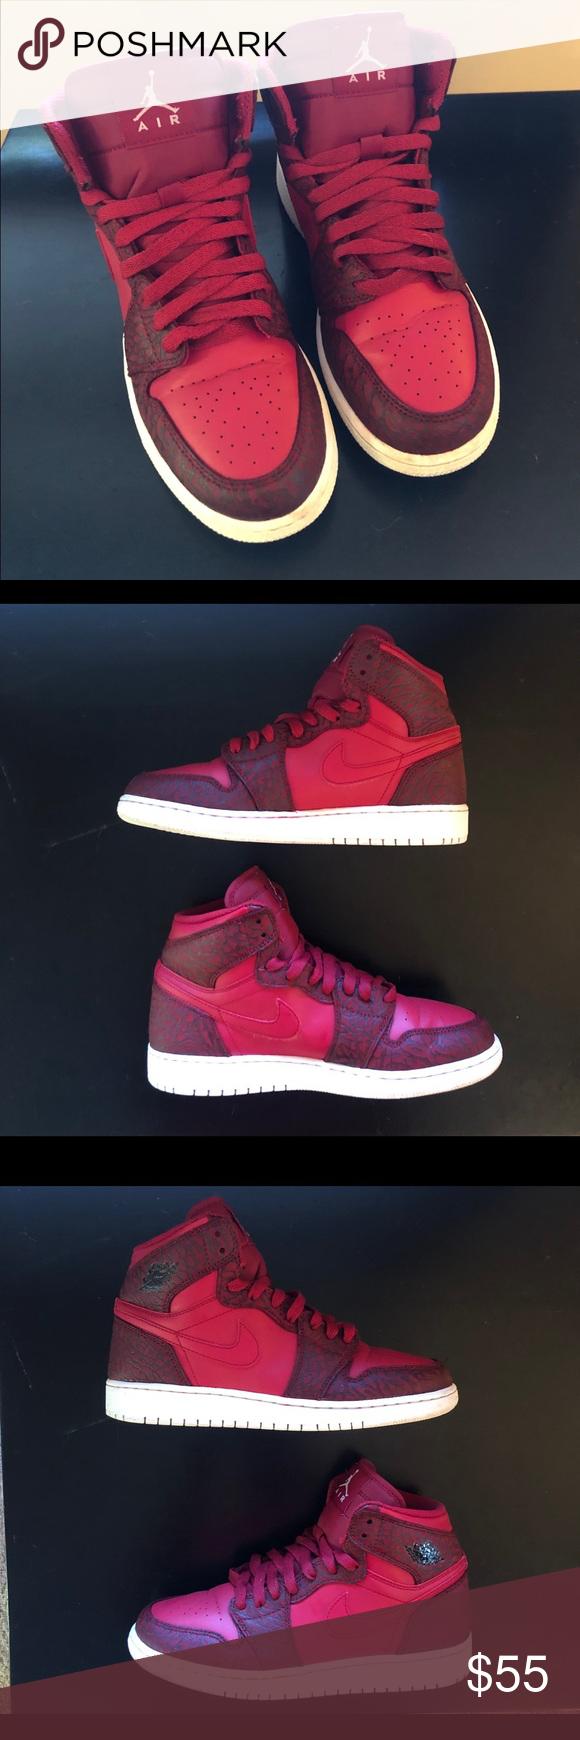 "Jordan 1 Retro Hi ""Red Elephant"", 6Y (6M/7.5W) Nike shoe"